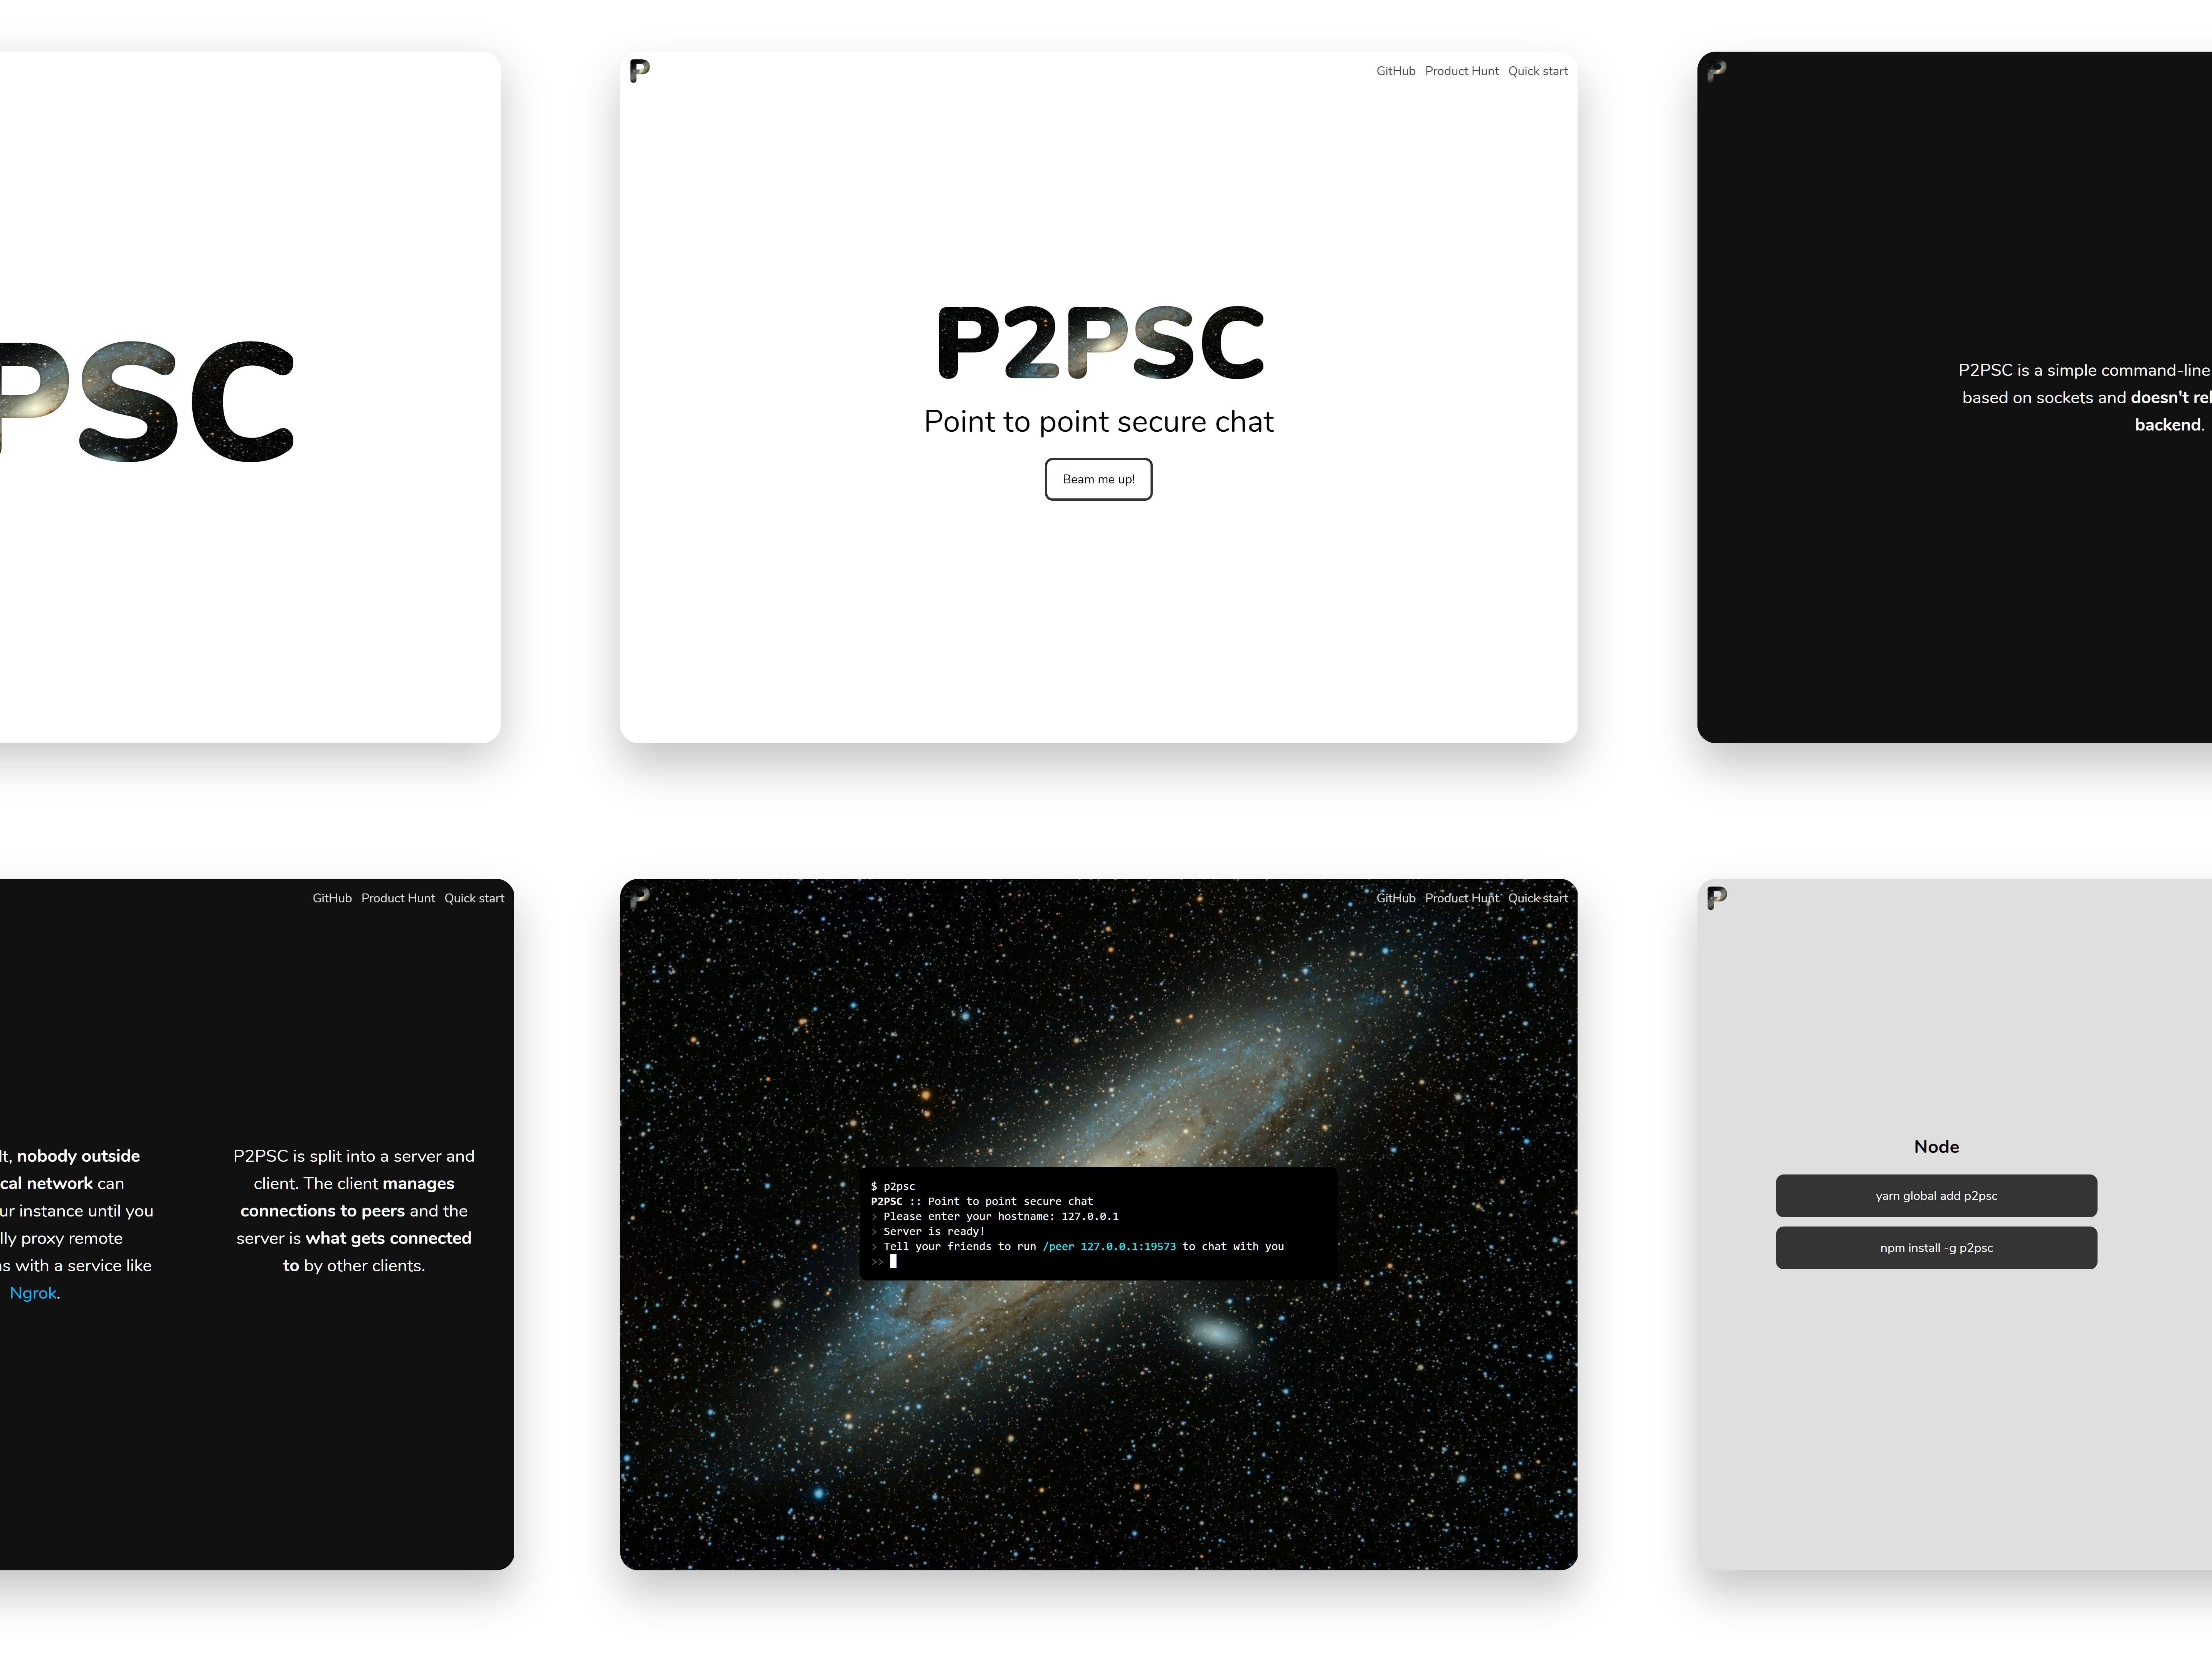 P2PSC by Kognise | Dribbble | Dribbble